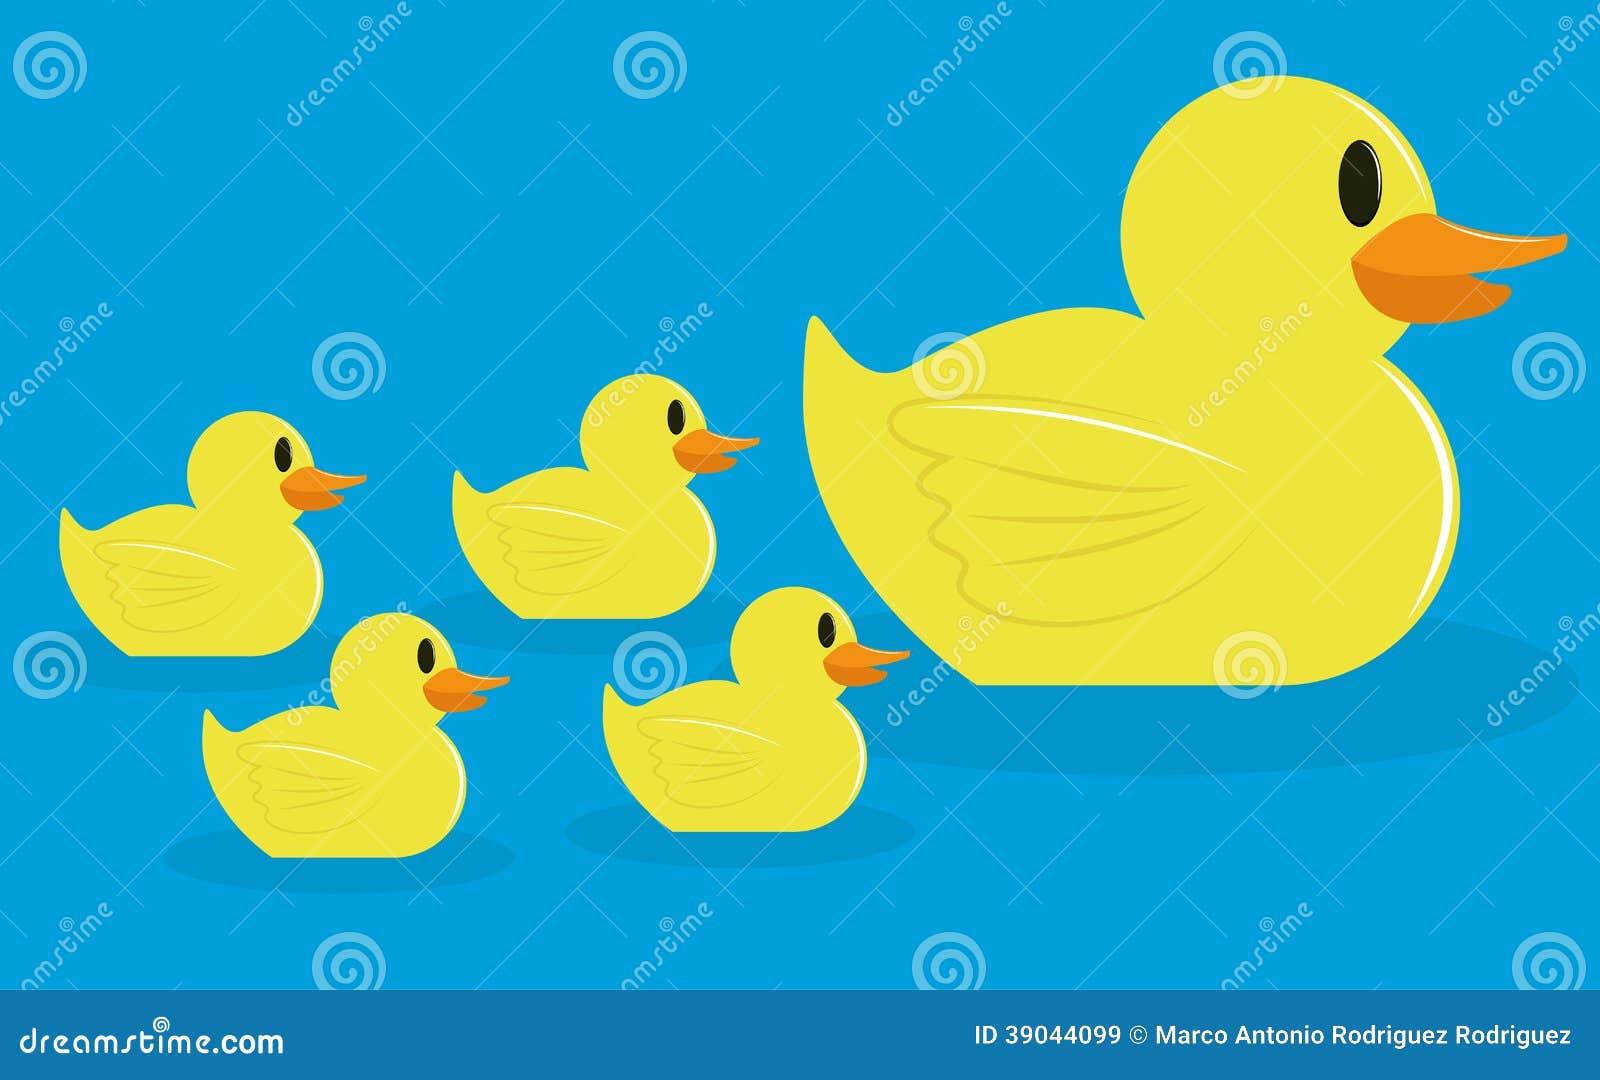 Group Of Adorable Cartoon Ducks Isolated Stock Vector